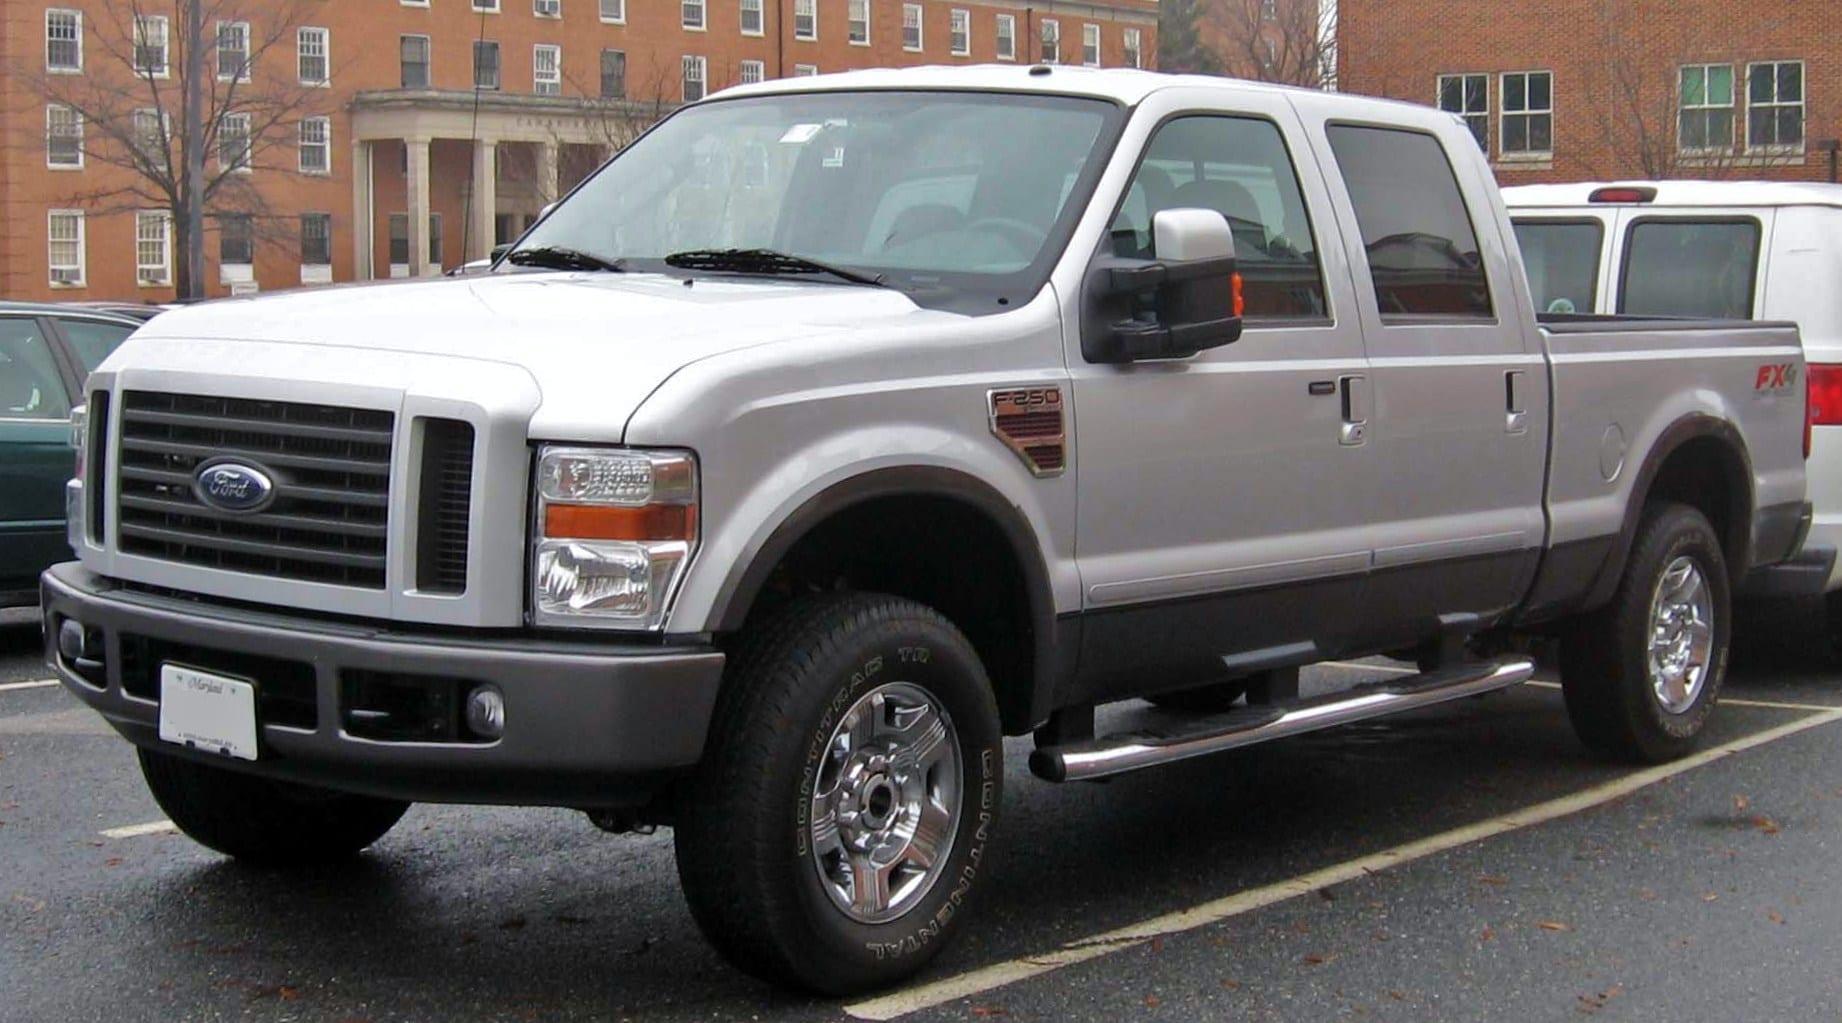 2008 Ford F250 Super Duty with 5R110 transmission